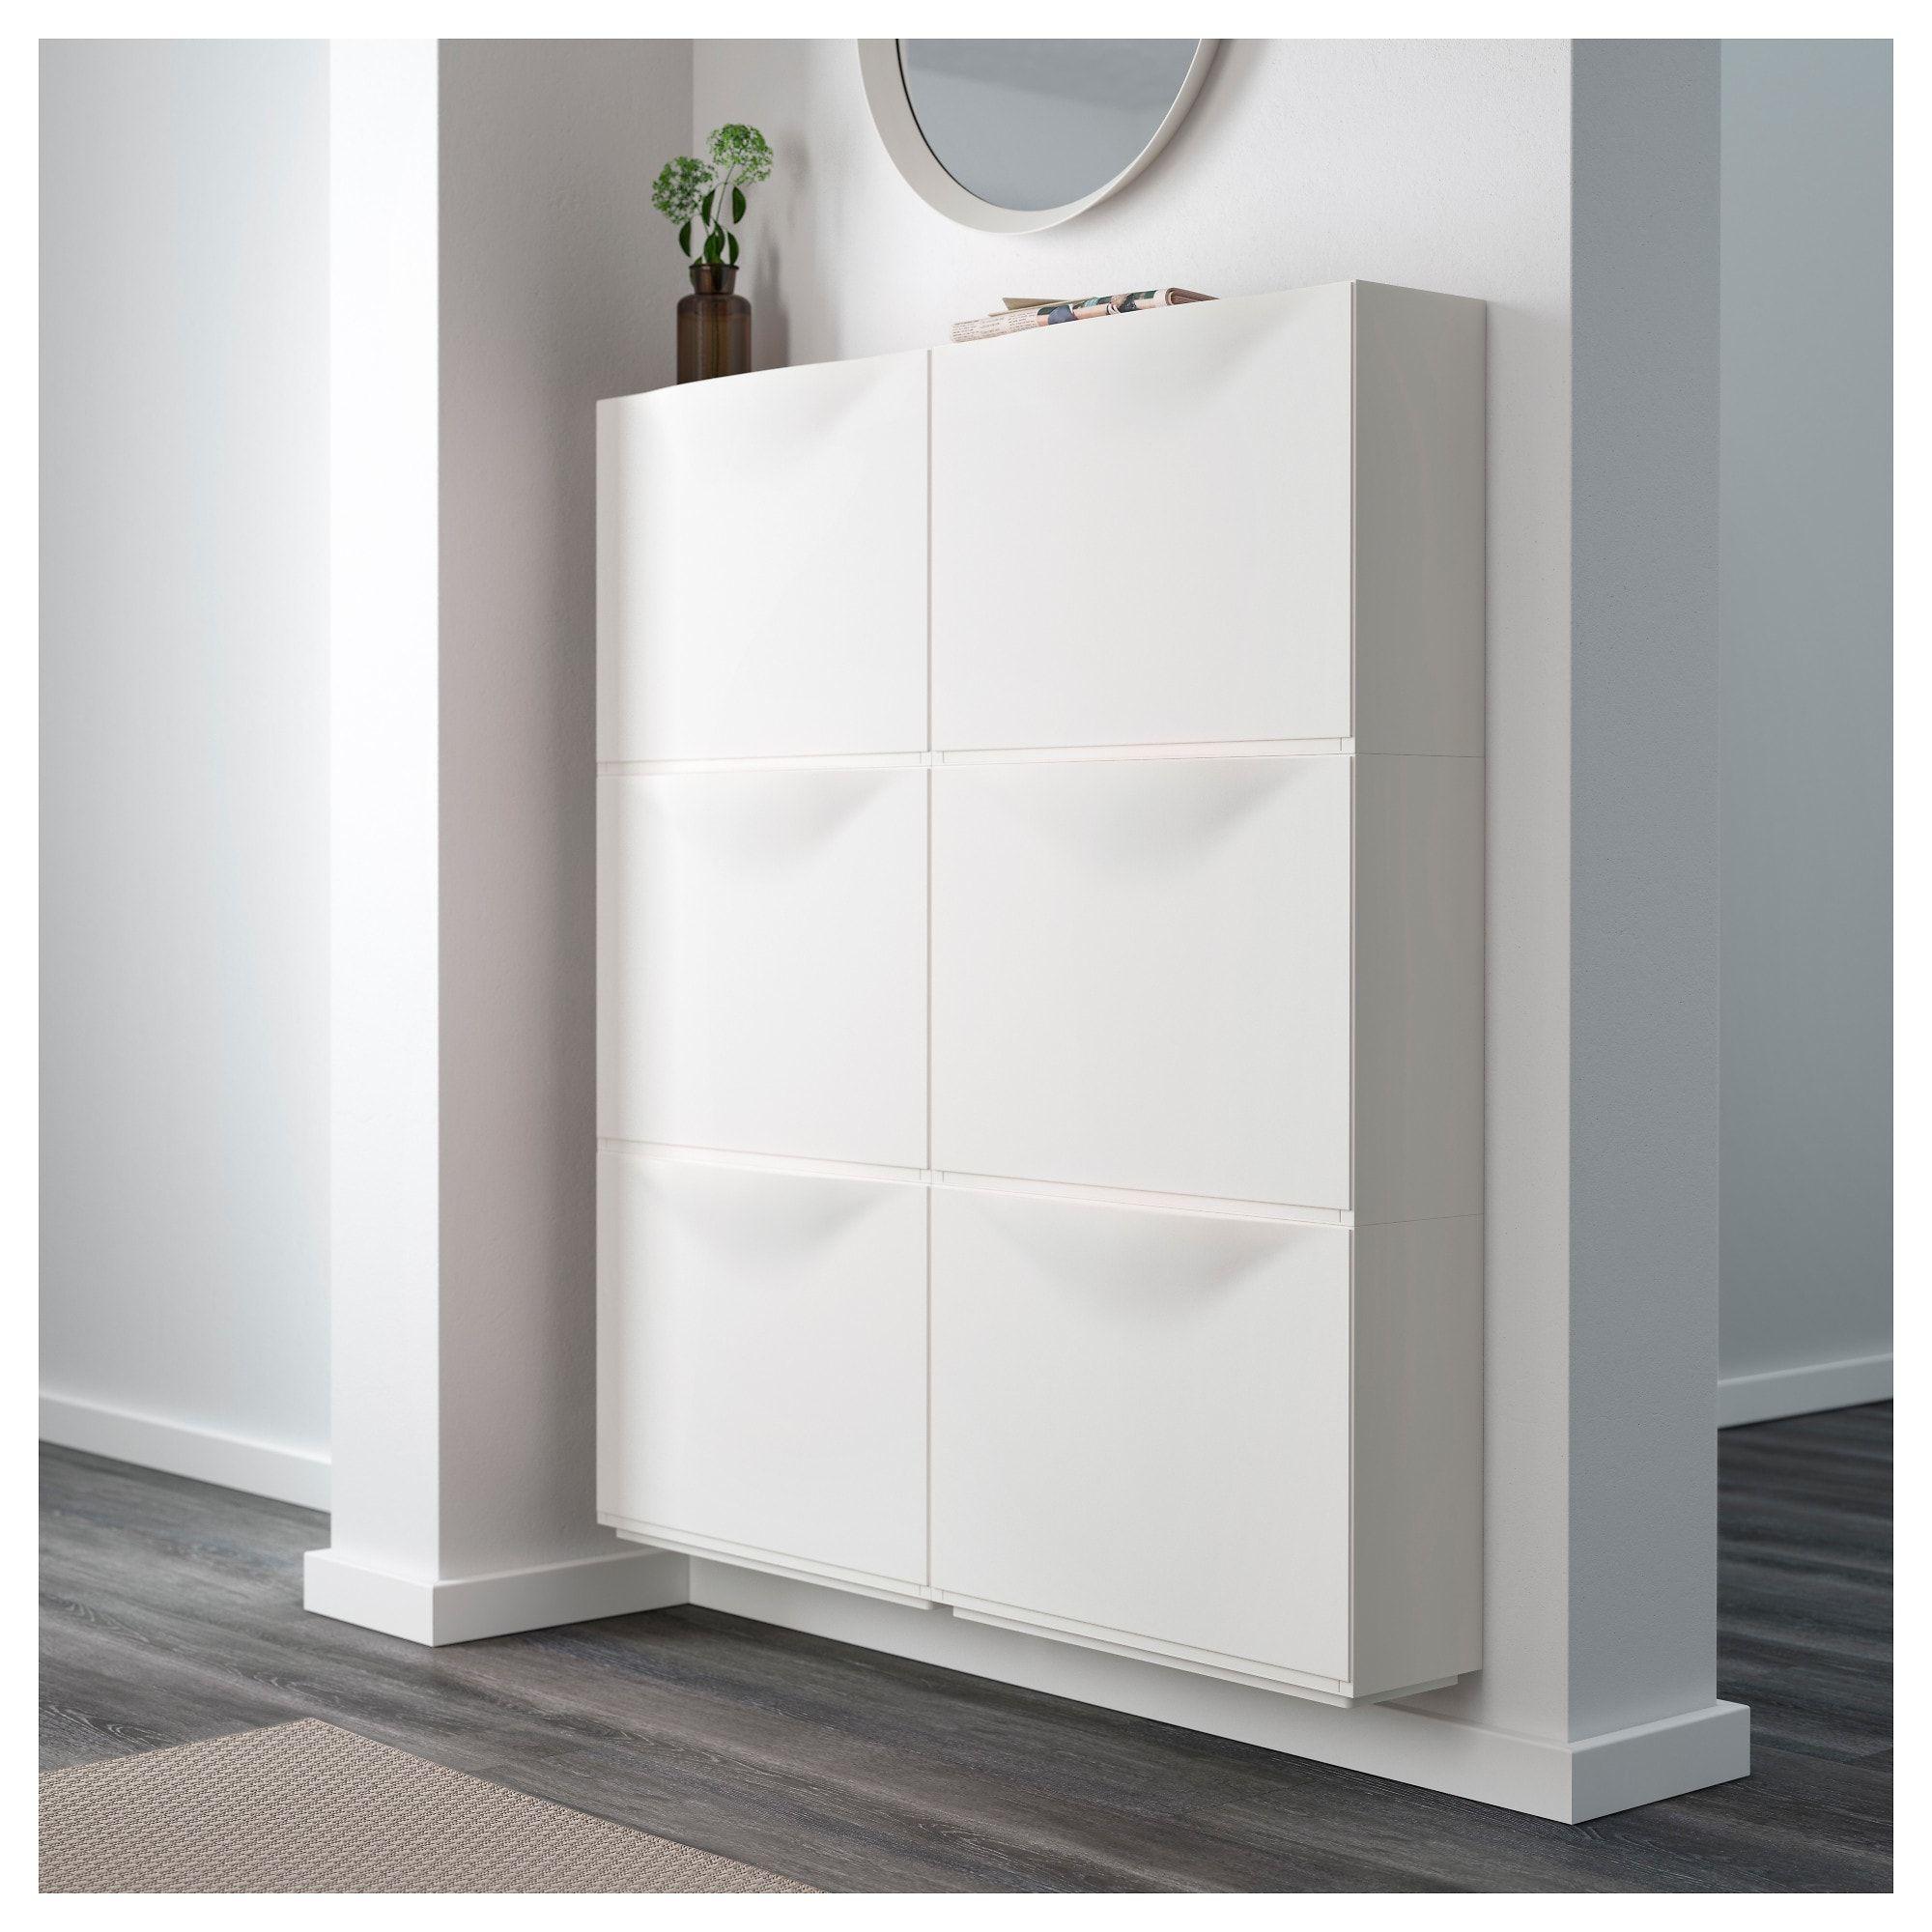 Trones Shoestorage Cabinet  Ikea